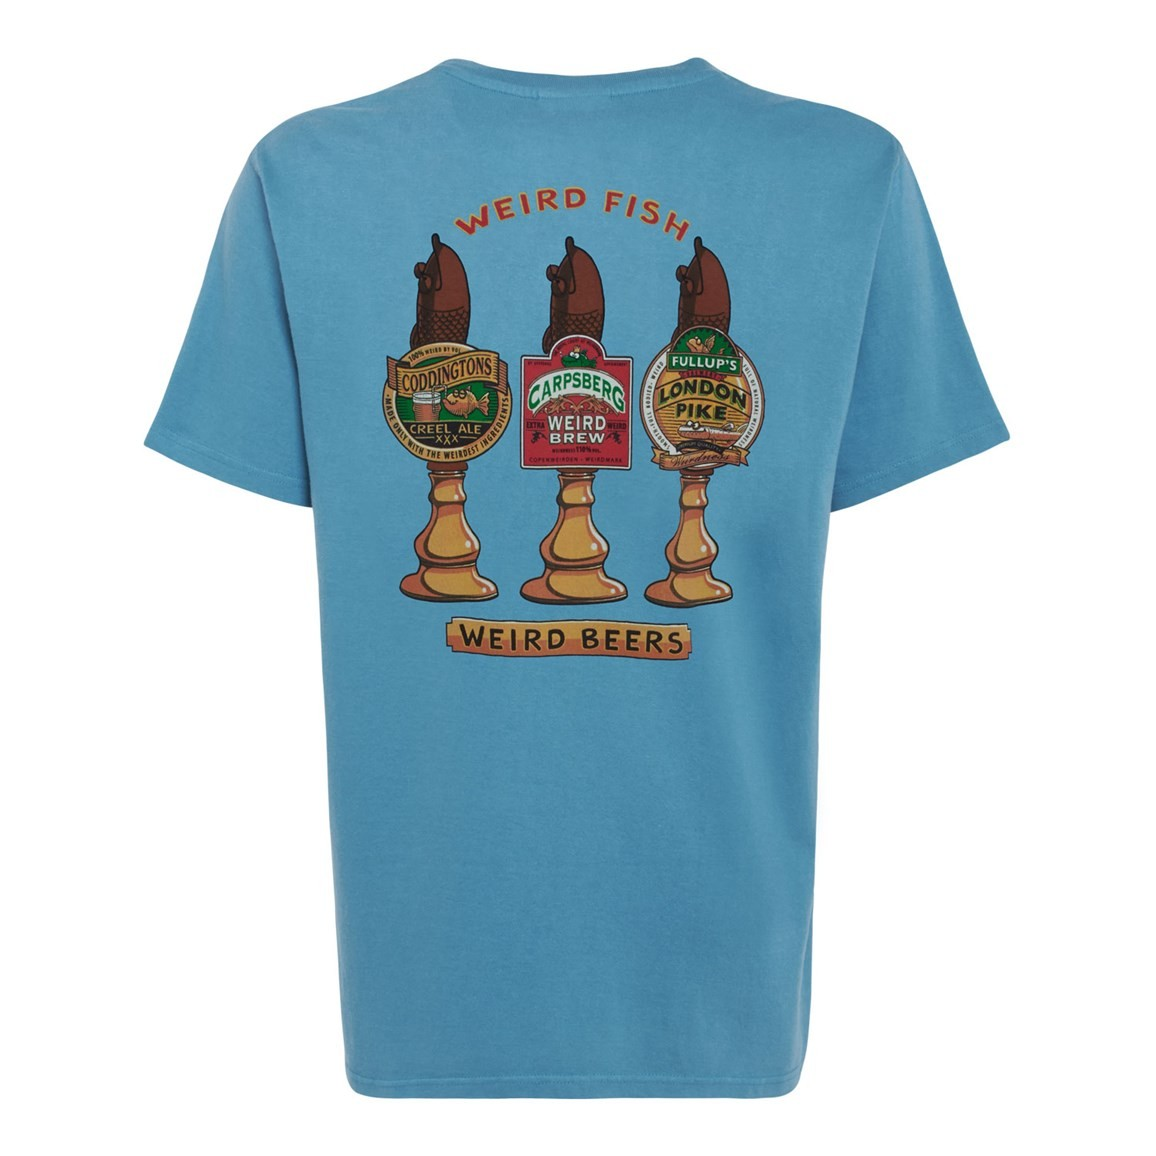 Weird Beers Printed Artist T-Shirt Adriatic Blue